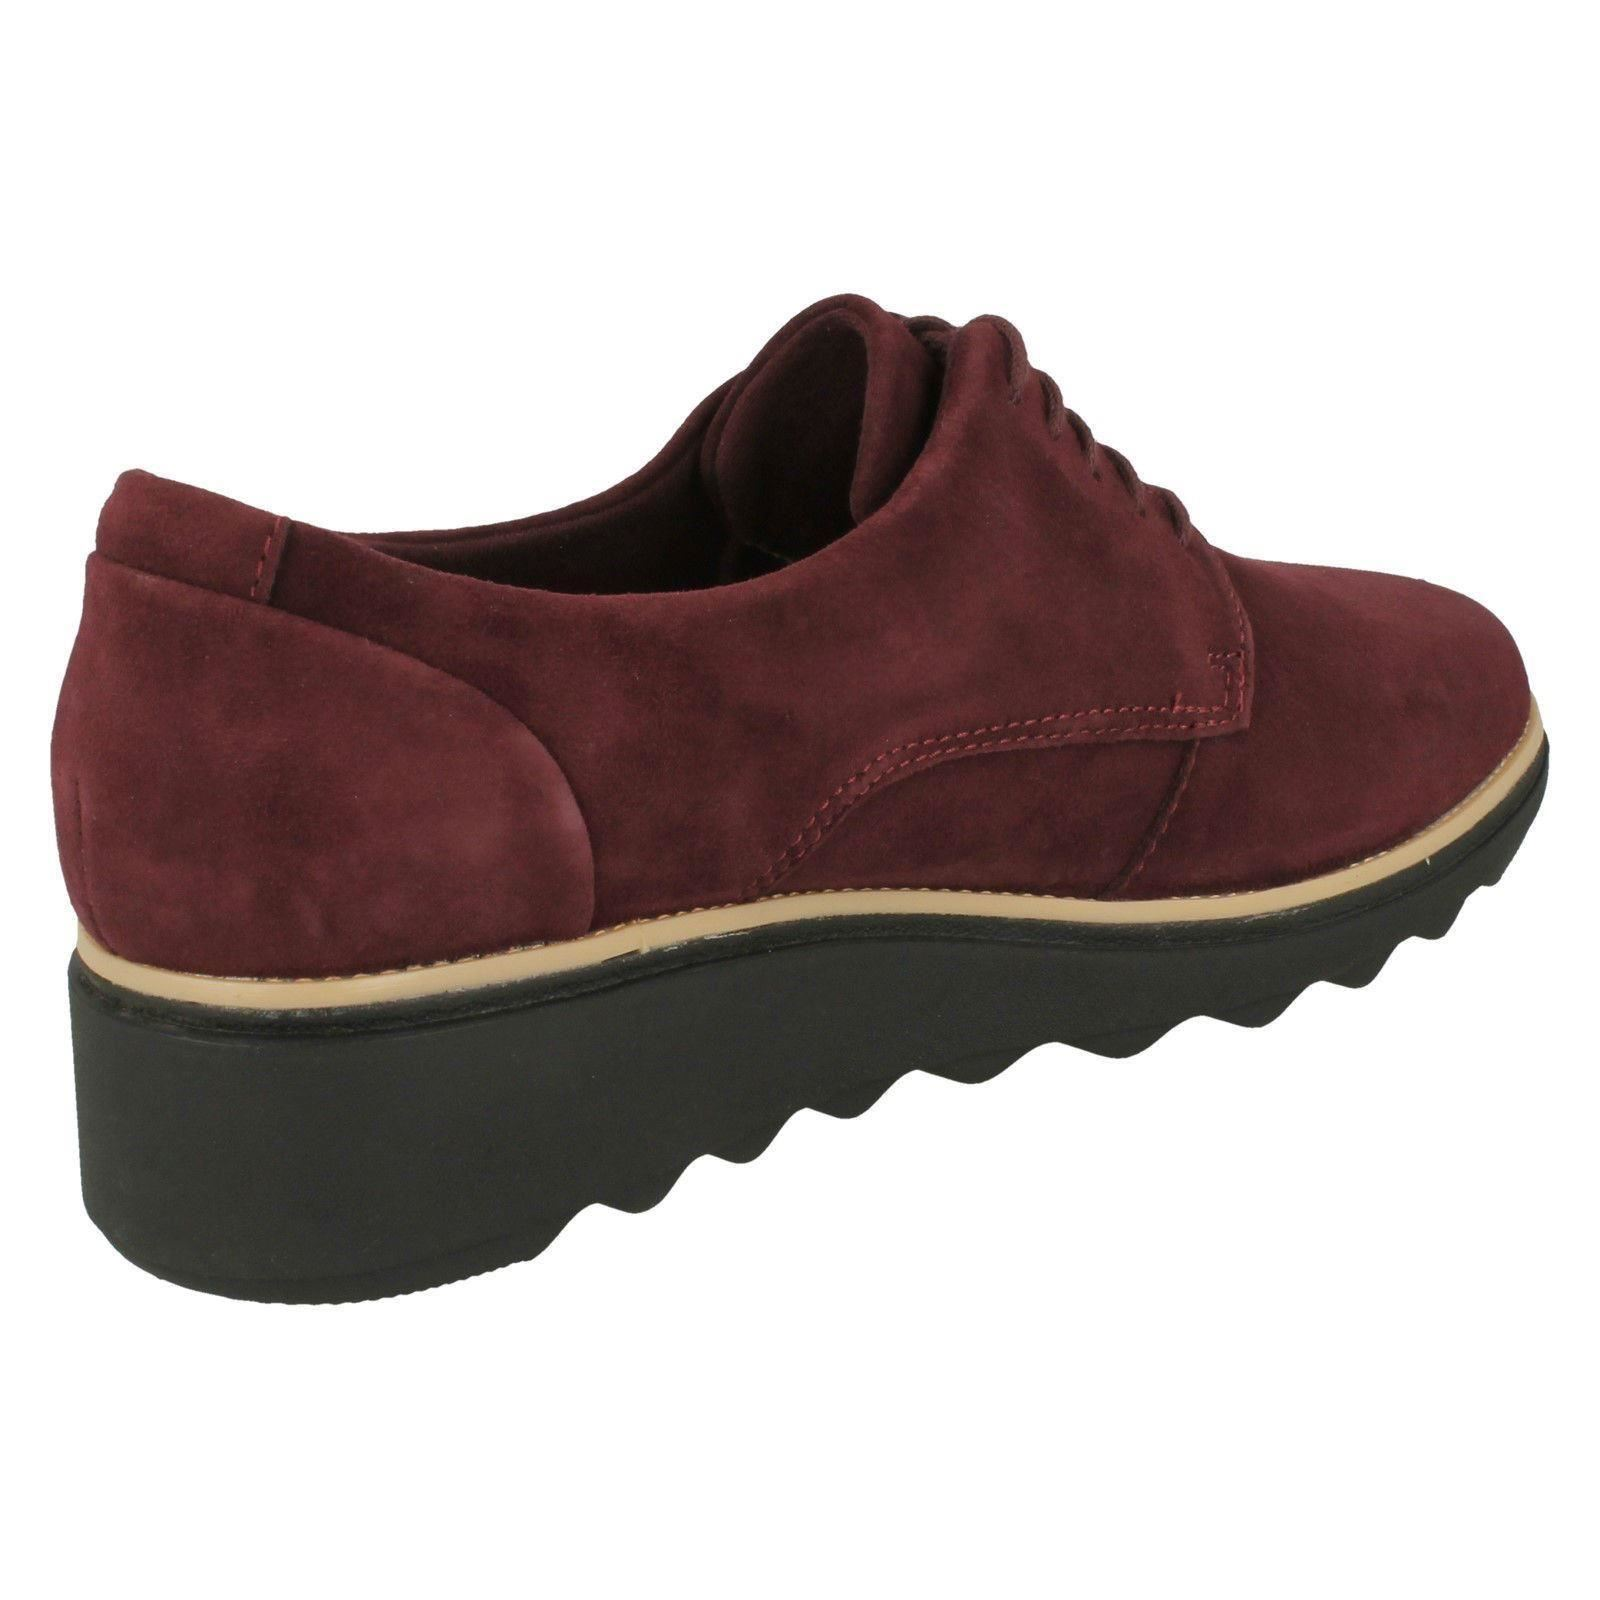 Femmes Clarks Smart Lacets Chaussures-Sharon NOEL